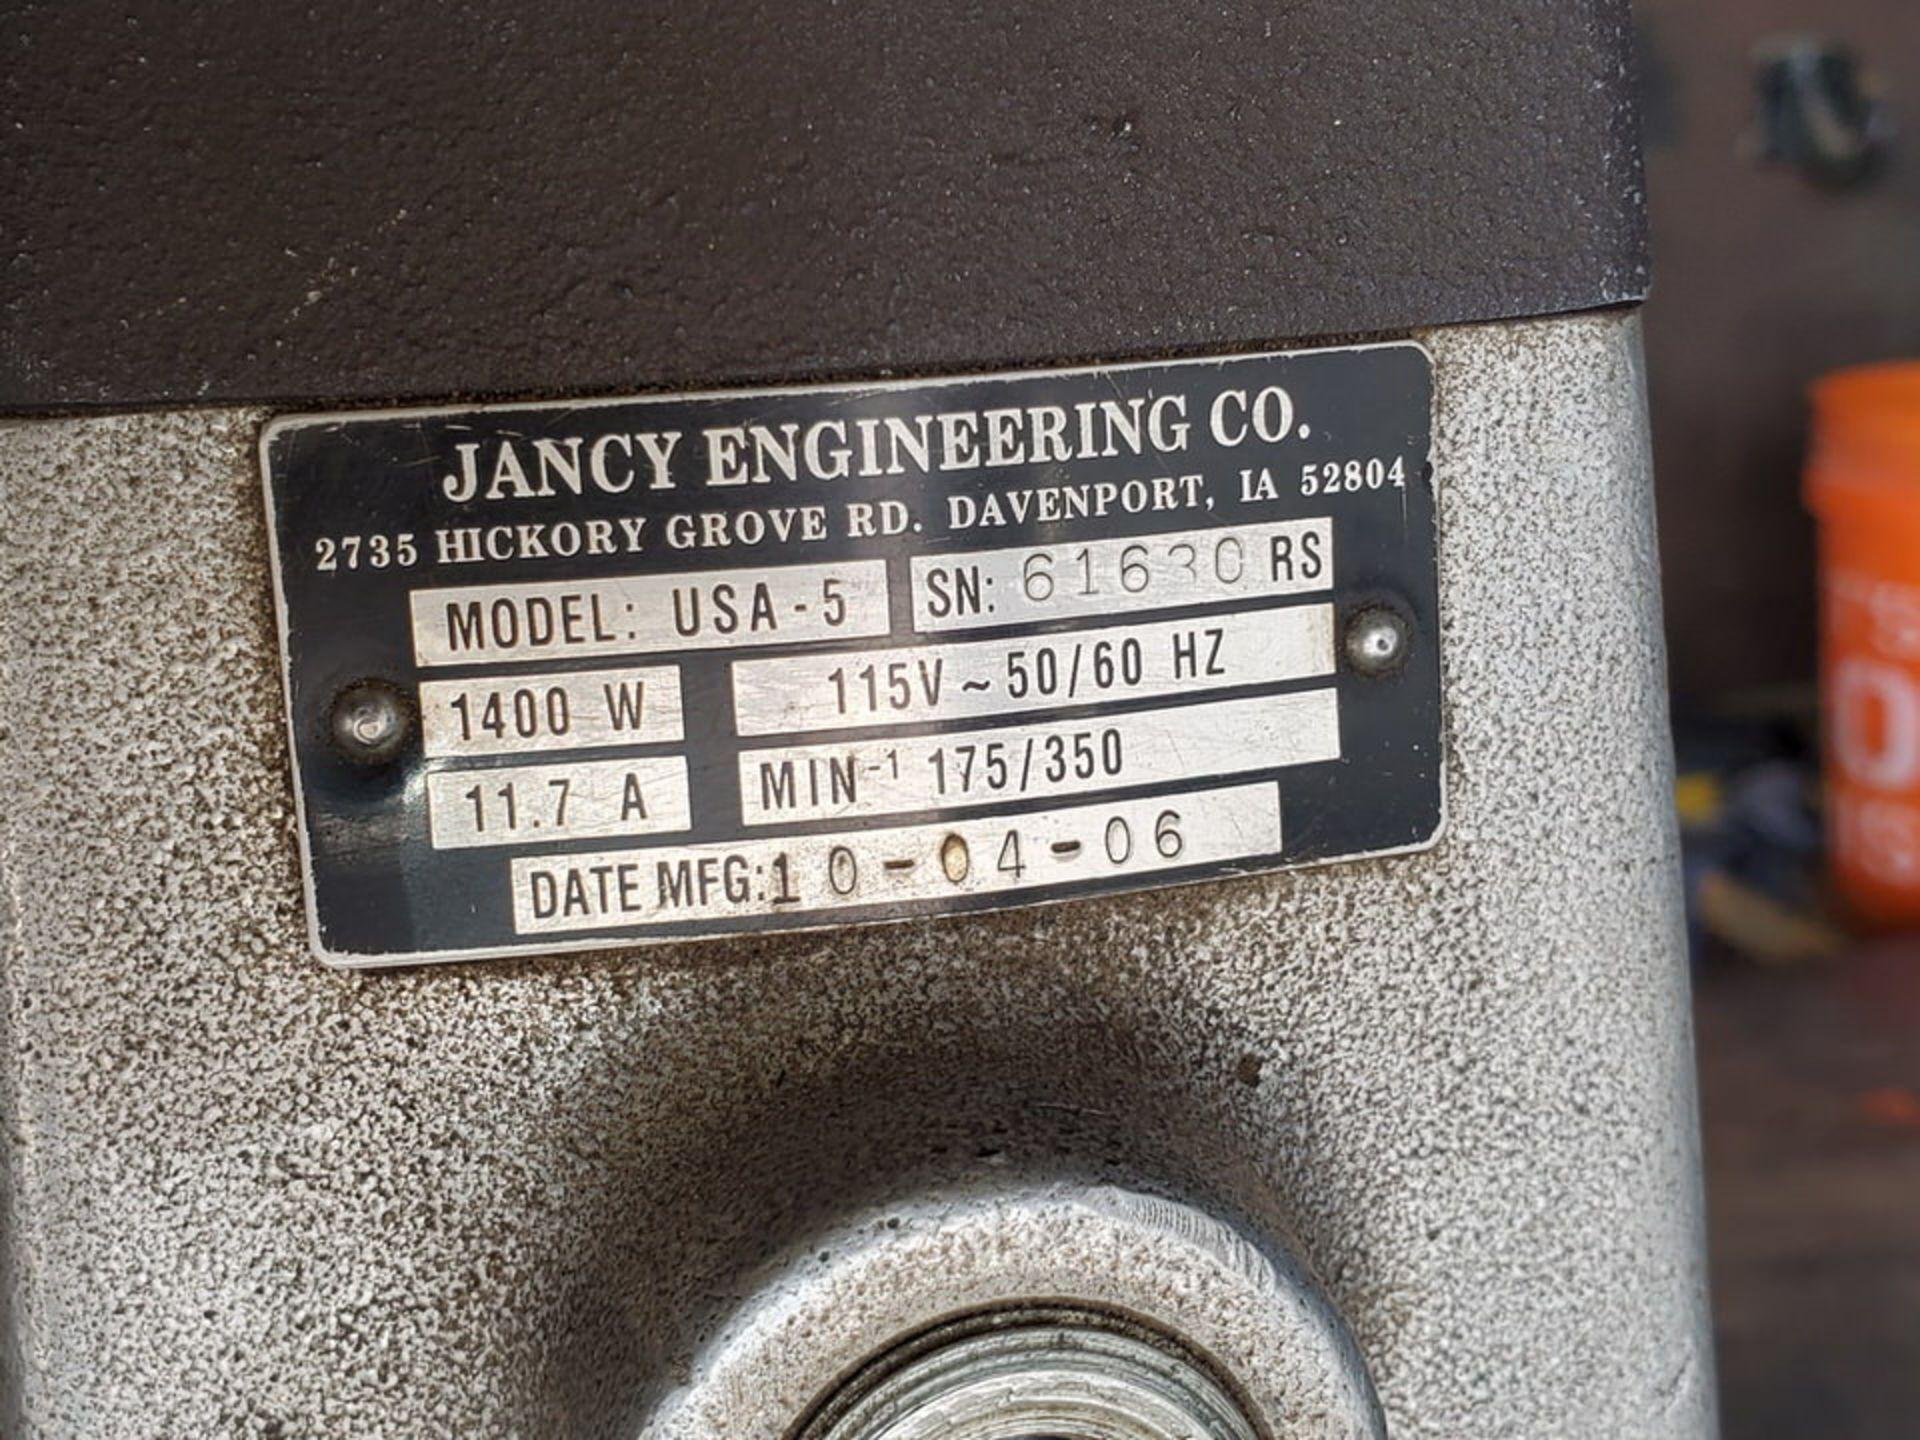 2006 Jancy Slugger USA-5 Mag Drill 115V, 11.7A, 50/60HZ, 1400W - Image 5 of 5